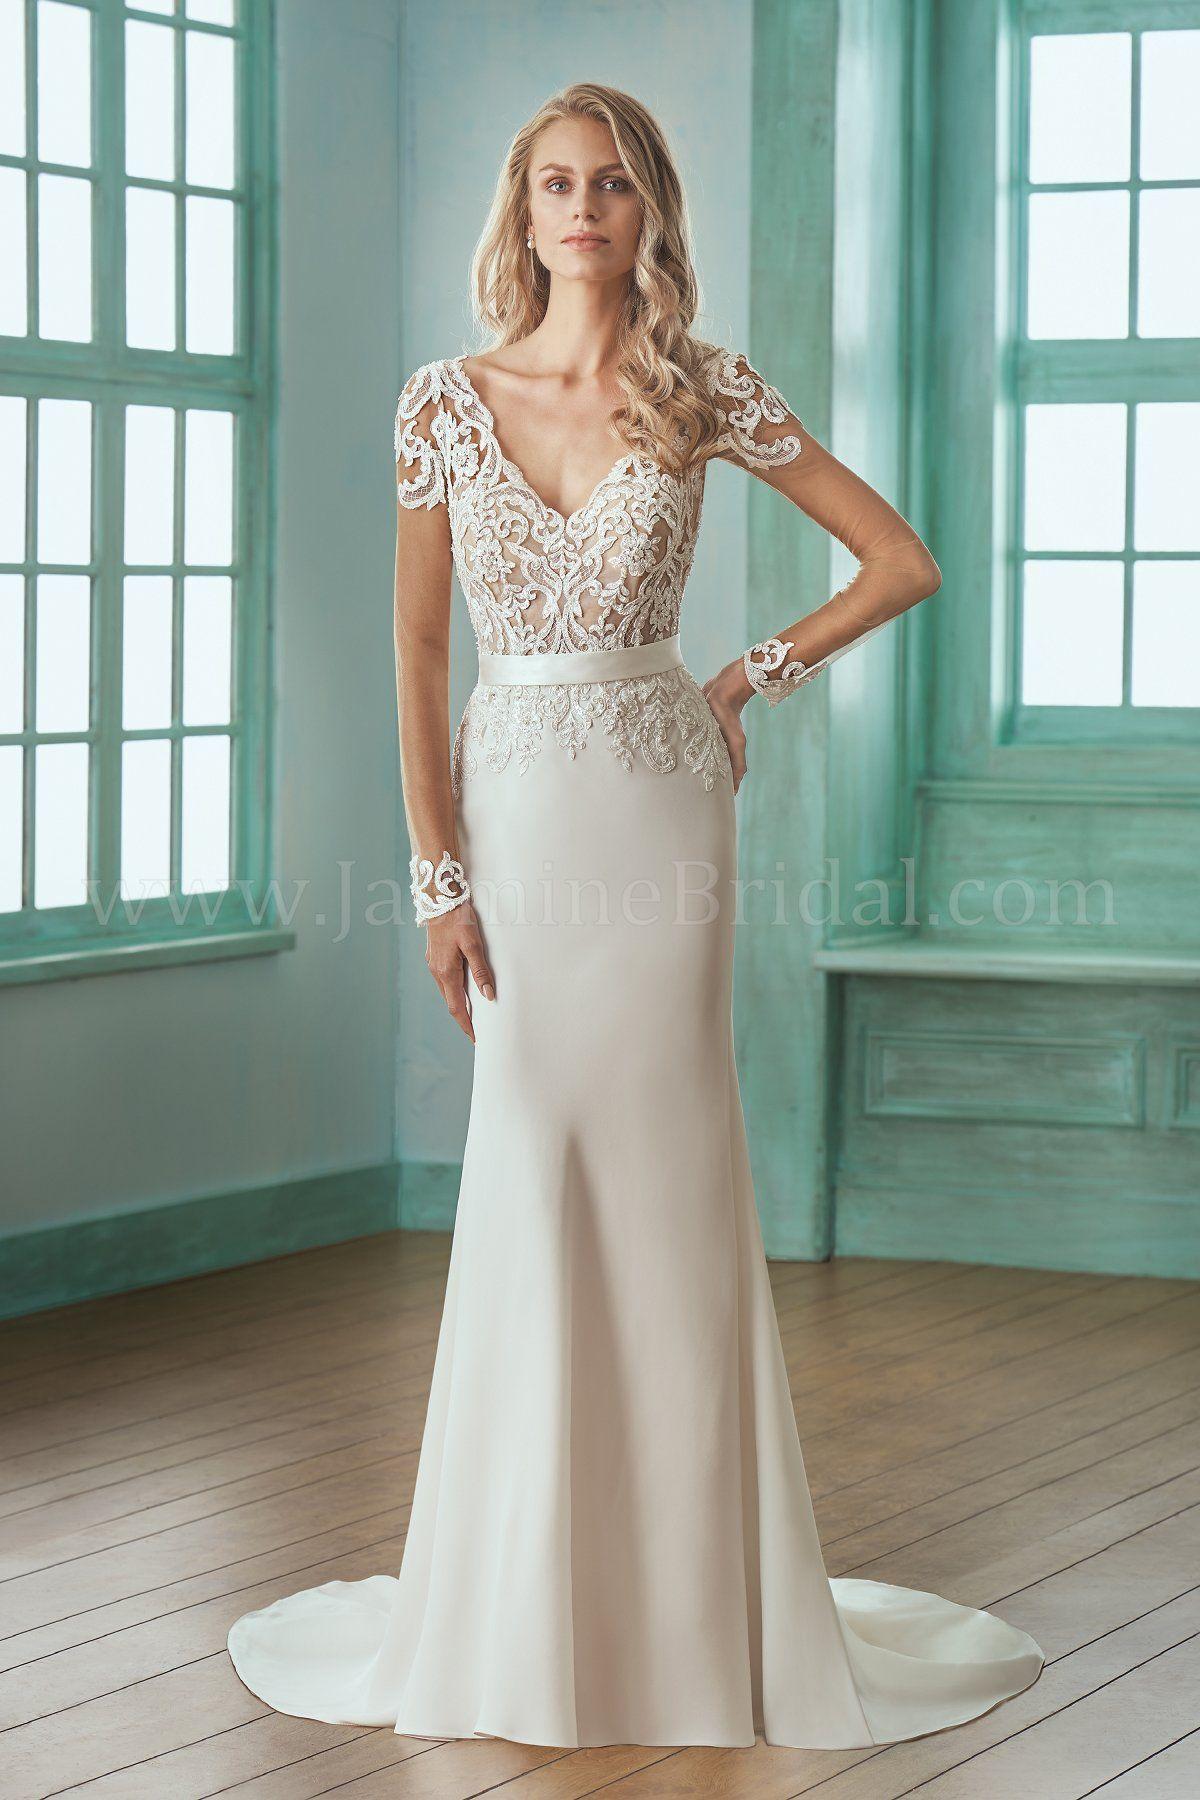 Jasmine Bridal Wedding Dresses Crepe Wedding Dress Wedding Dress Long Sleeve